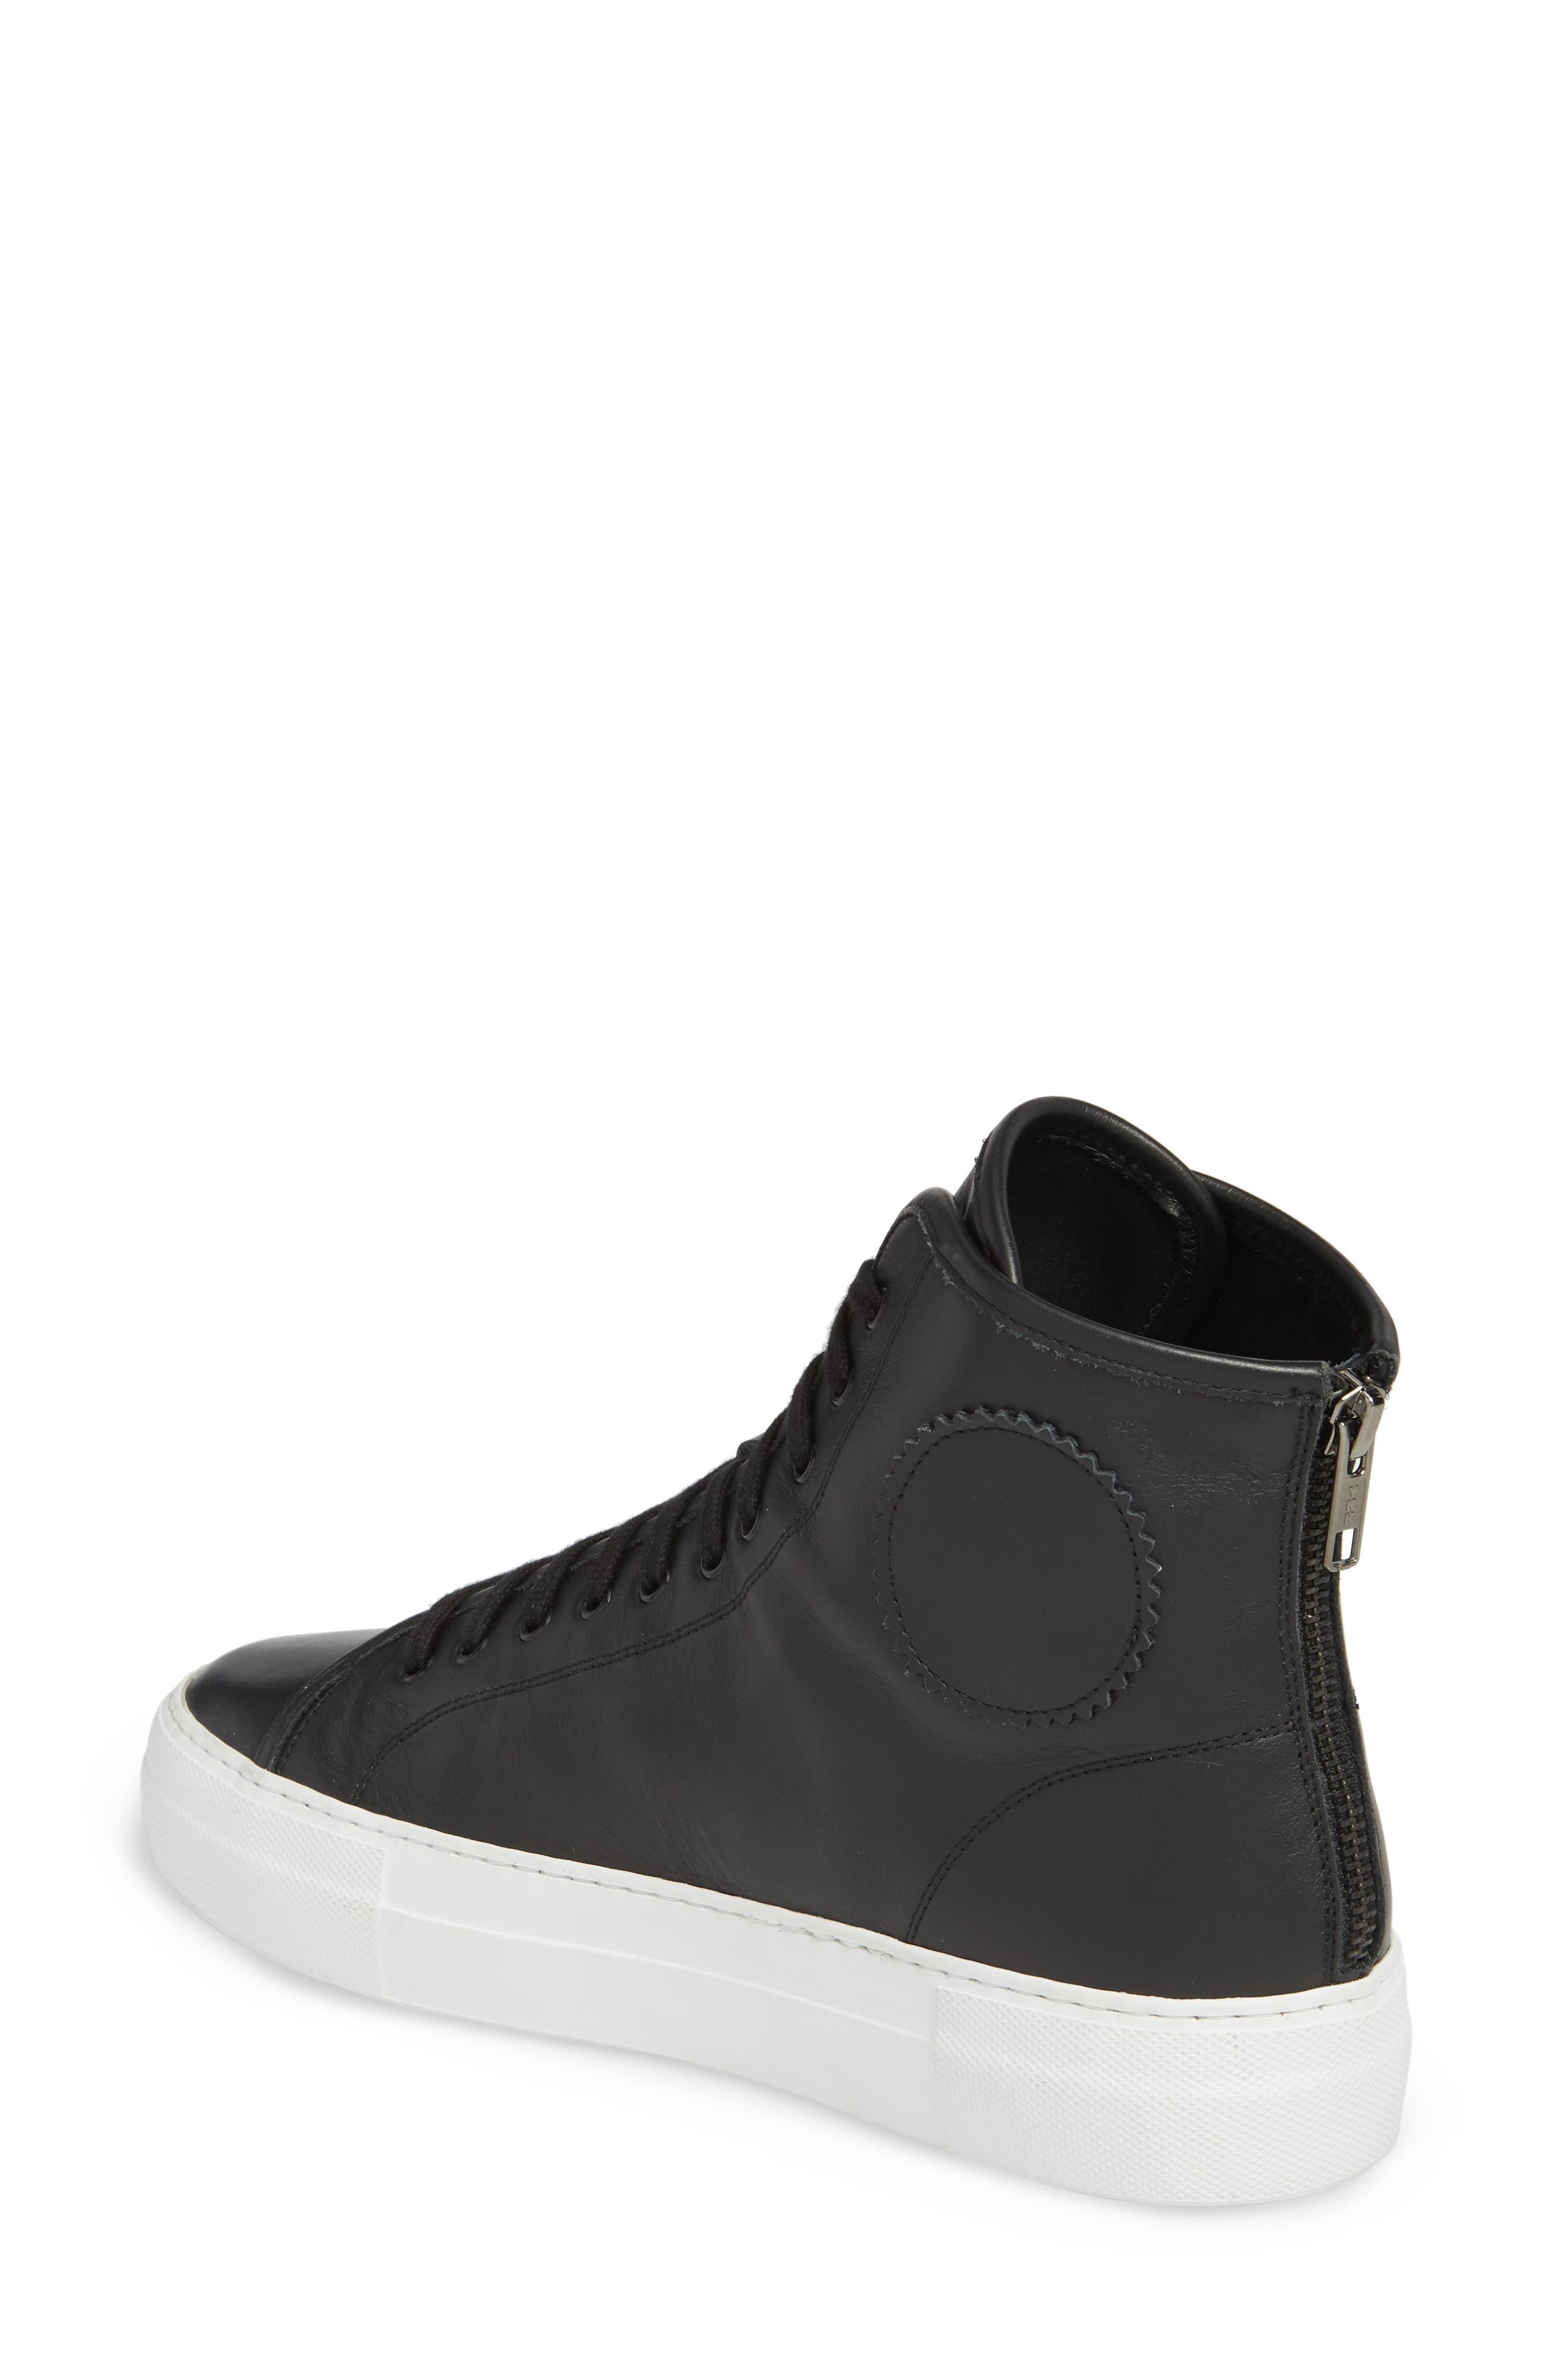 COMMON PROJECTS, Tournament High Super Sneaker, Alternate thumbnail 2, color, BLACK/ WHITE